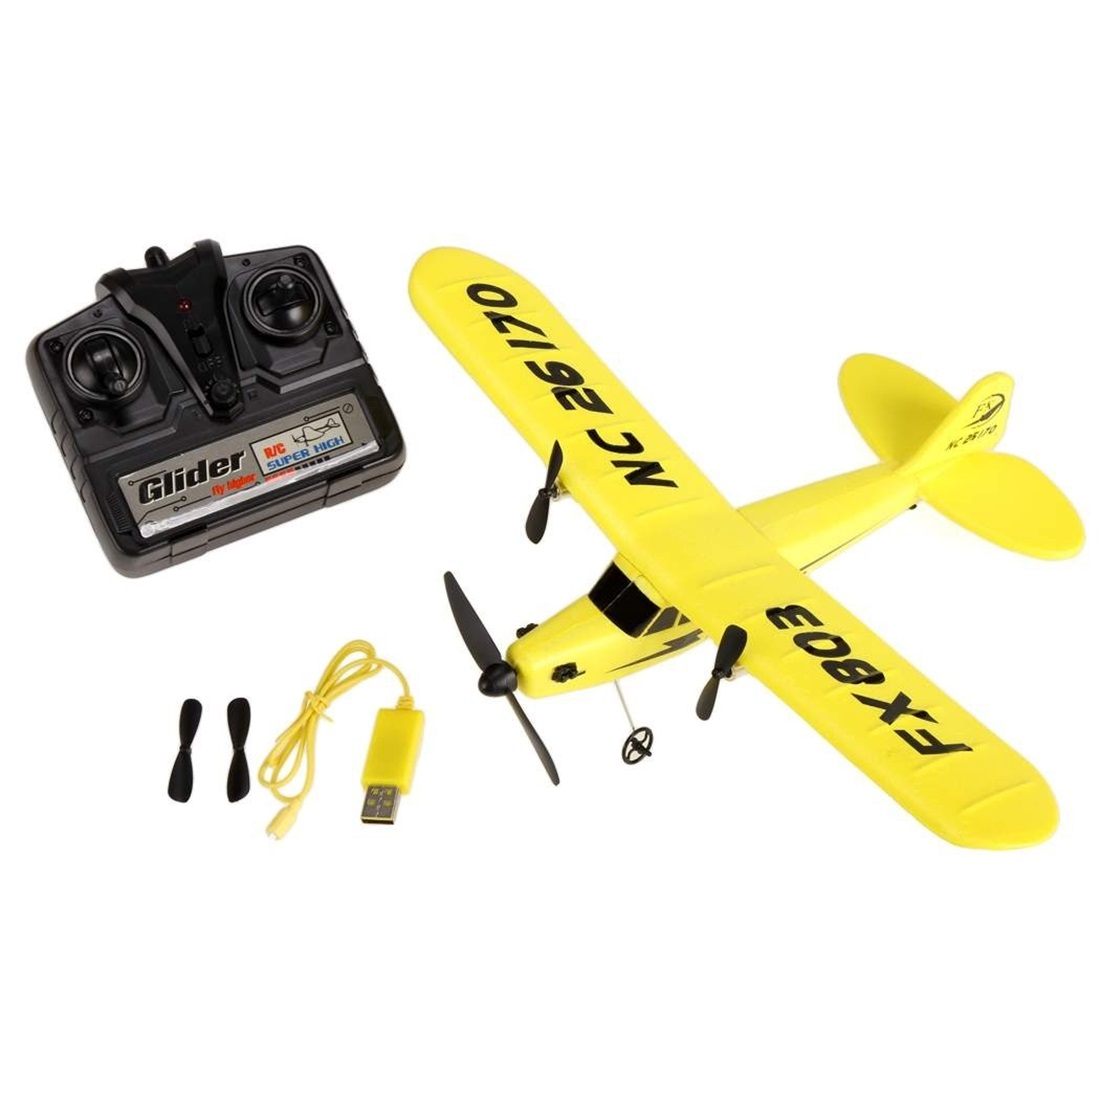 FX HL 803 Electric font b RC b font font b Helicopter b font Plane Glider